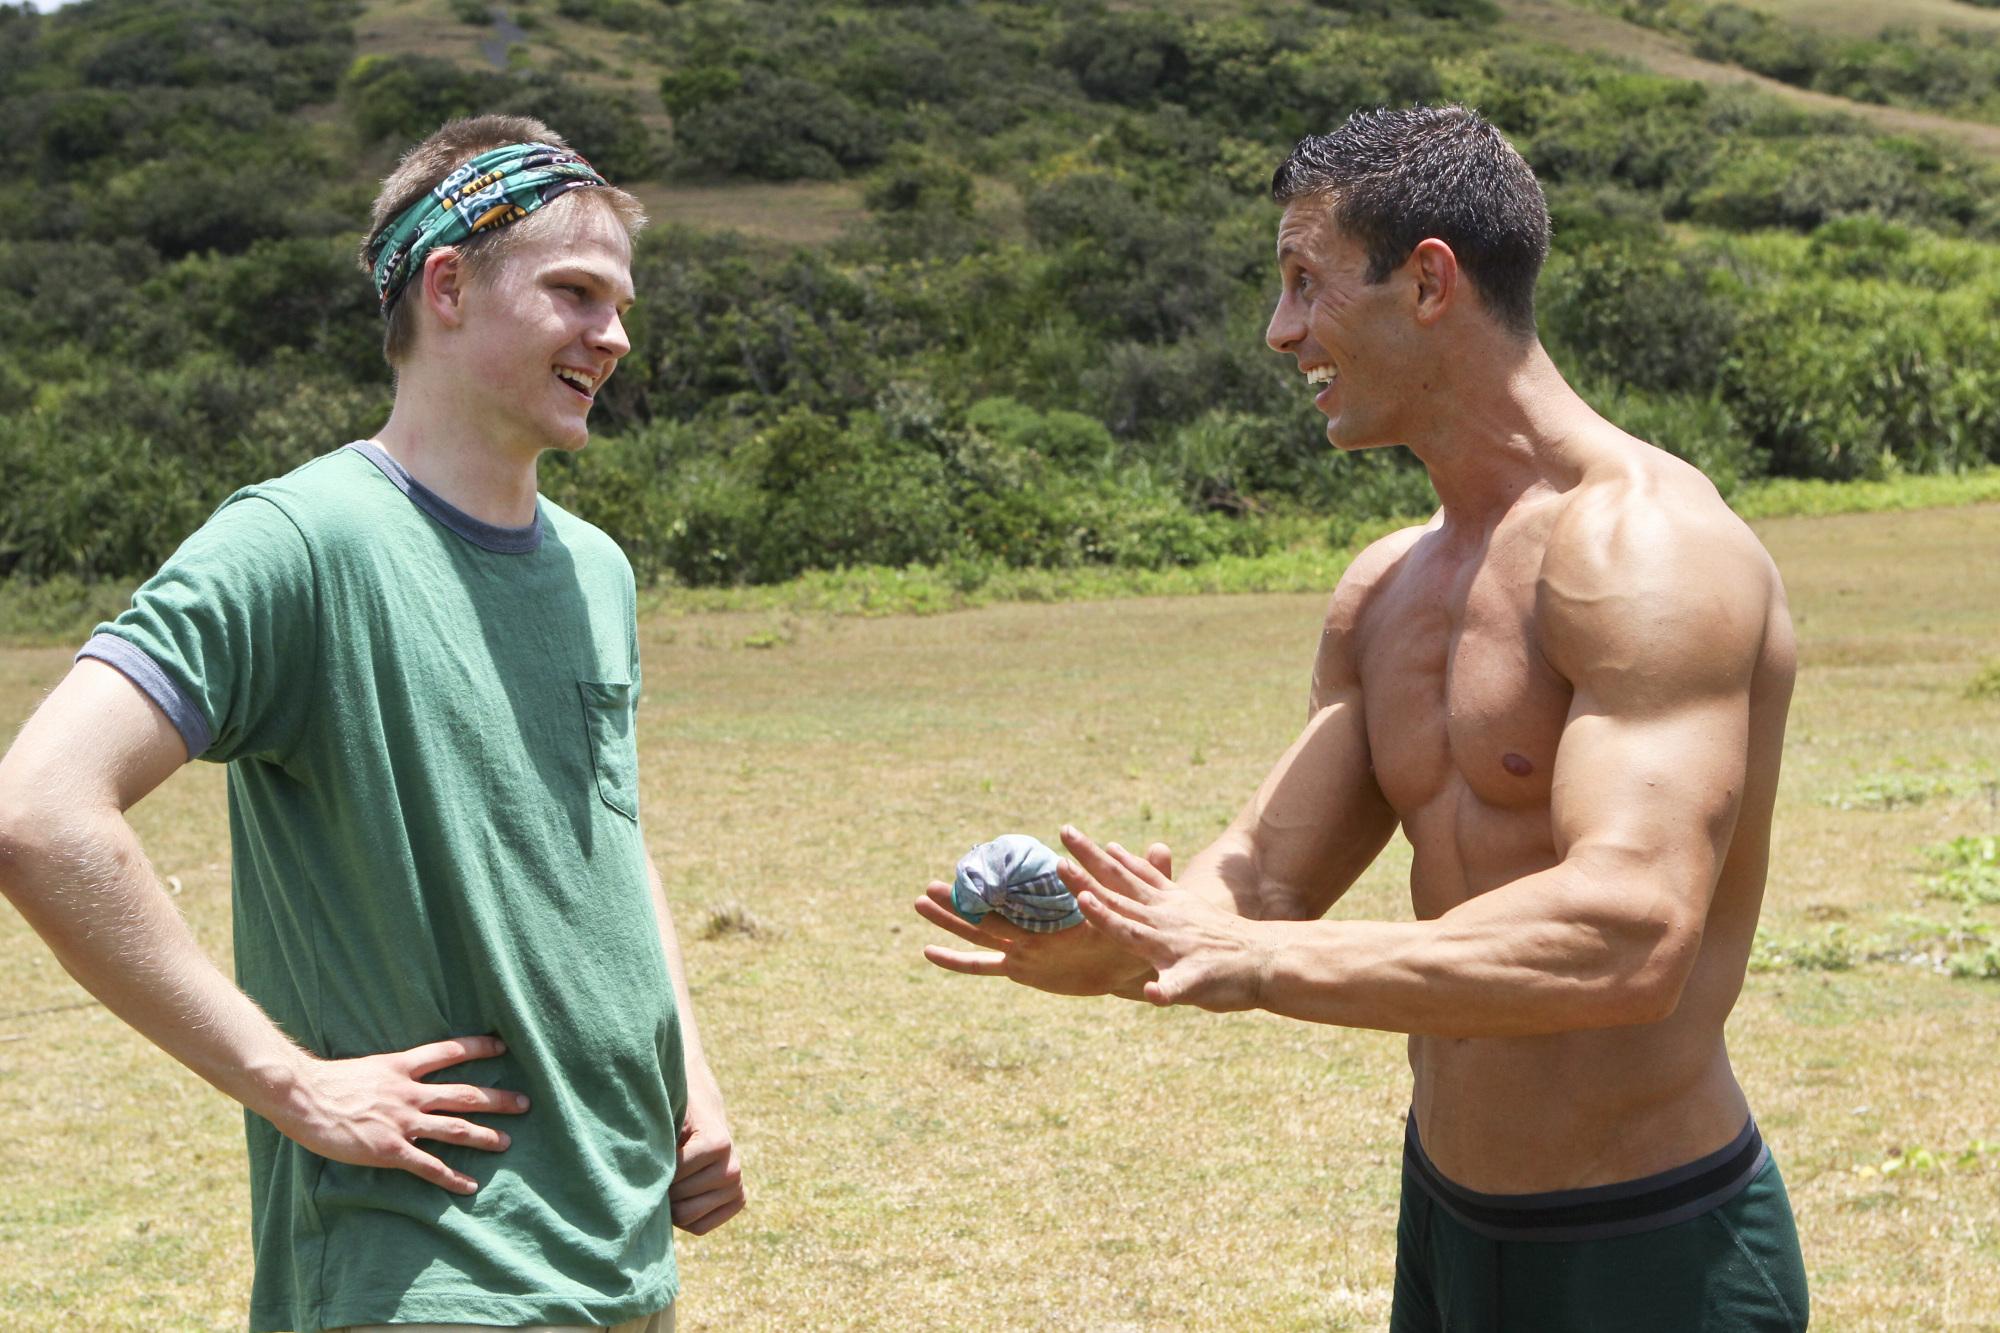 Spencer and Garrett in the Season 28 premiere